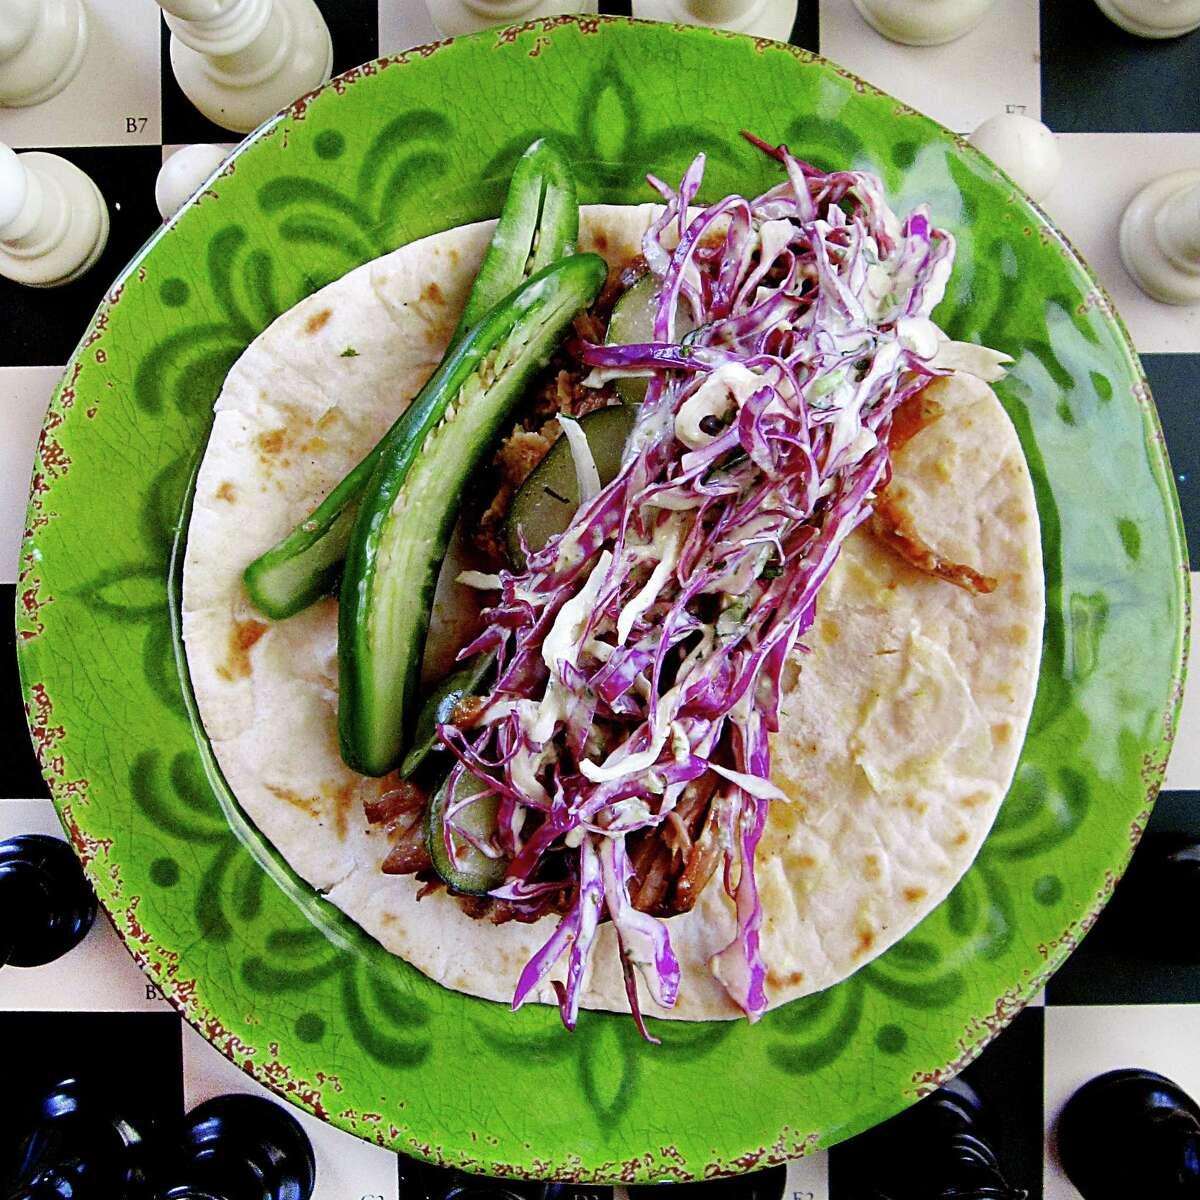 Week 11 Taco of the Week: El Purple Rain taco with barbecue pork, slaw and serranos at Sabinas Coffee House.